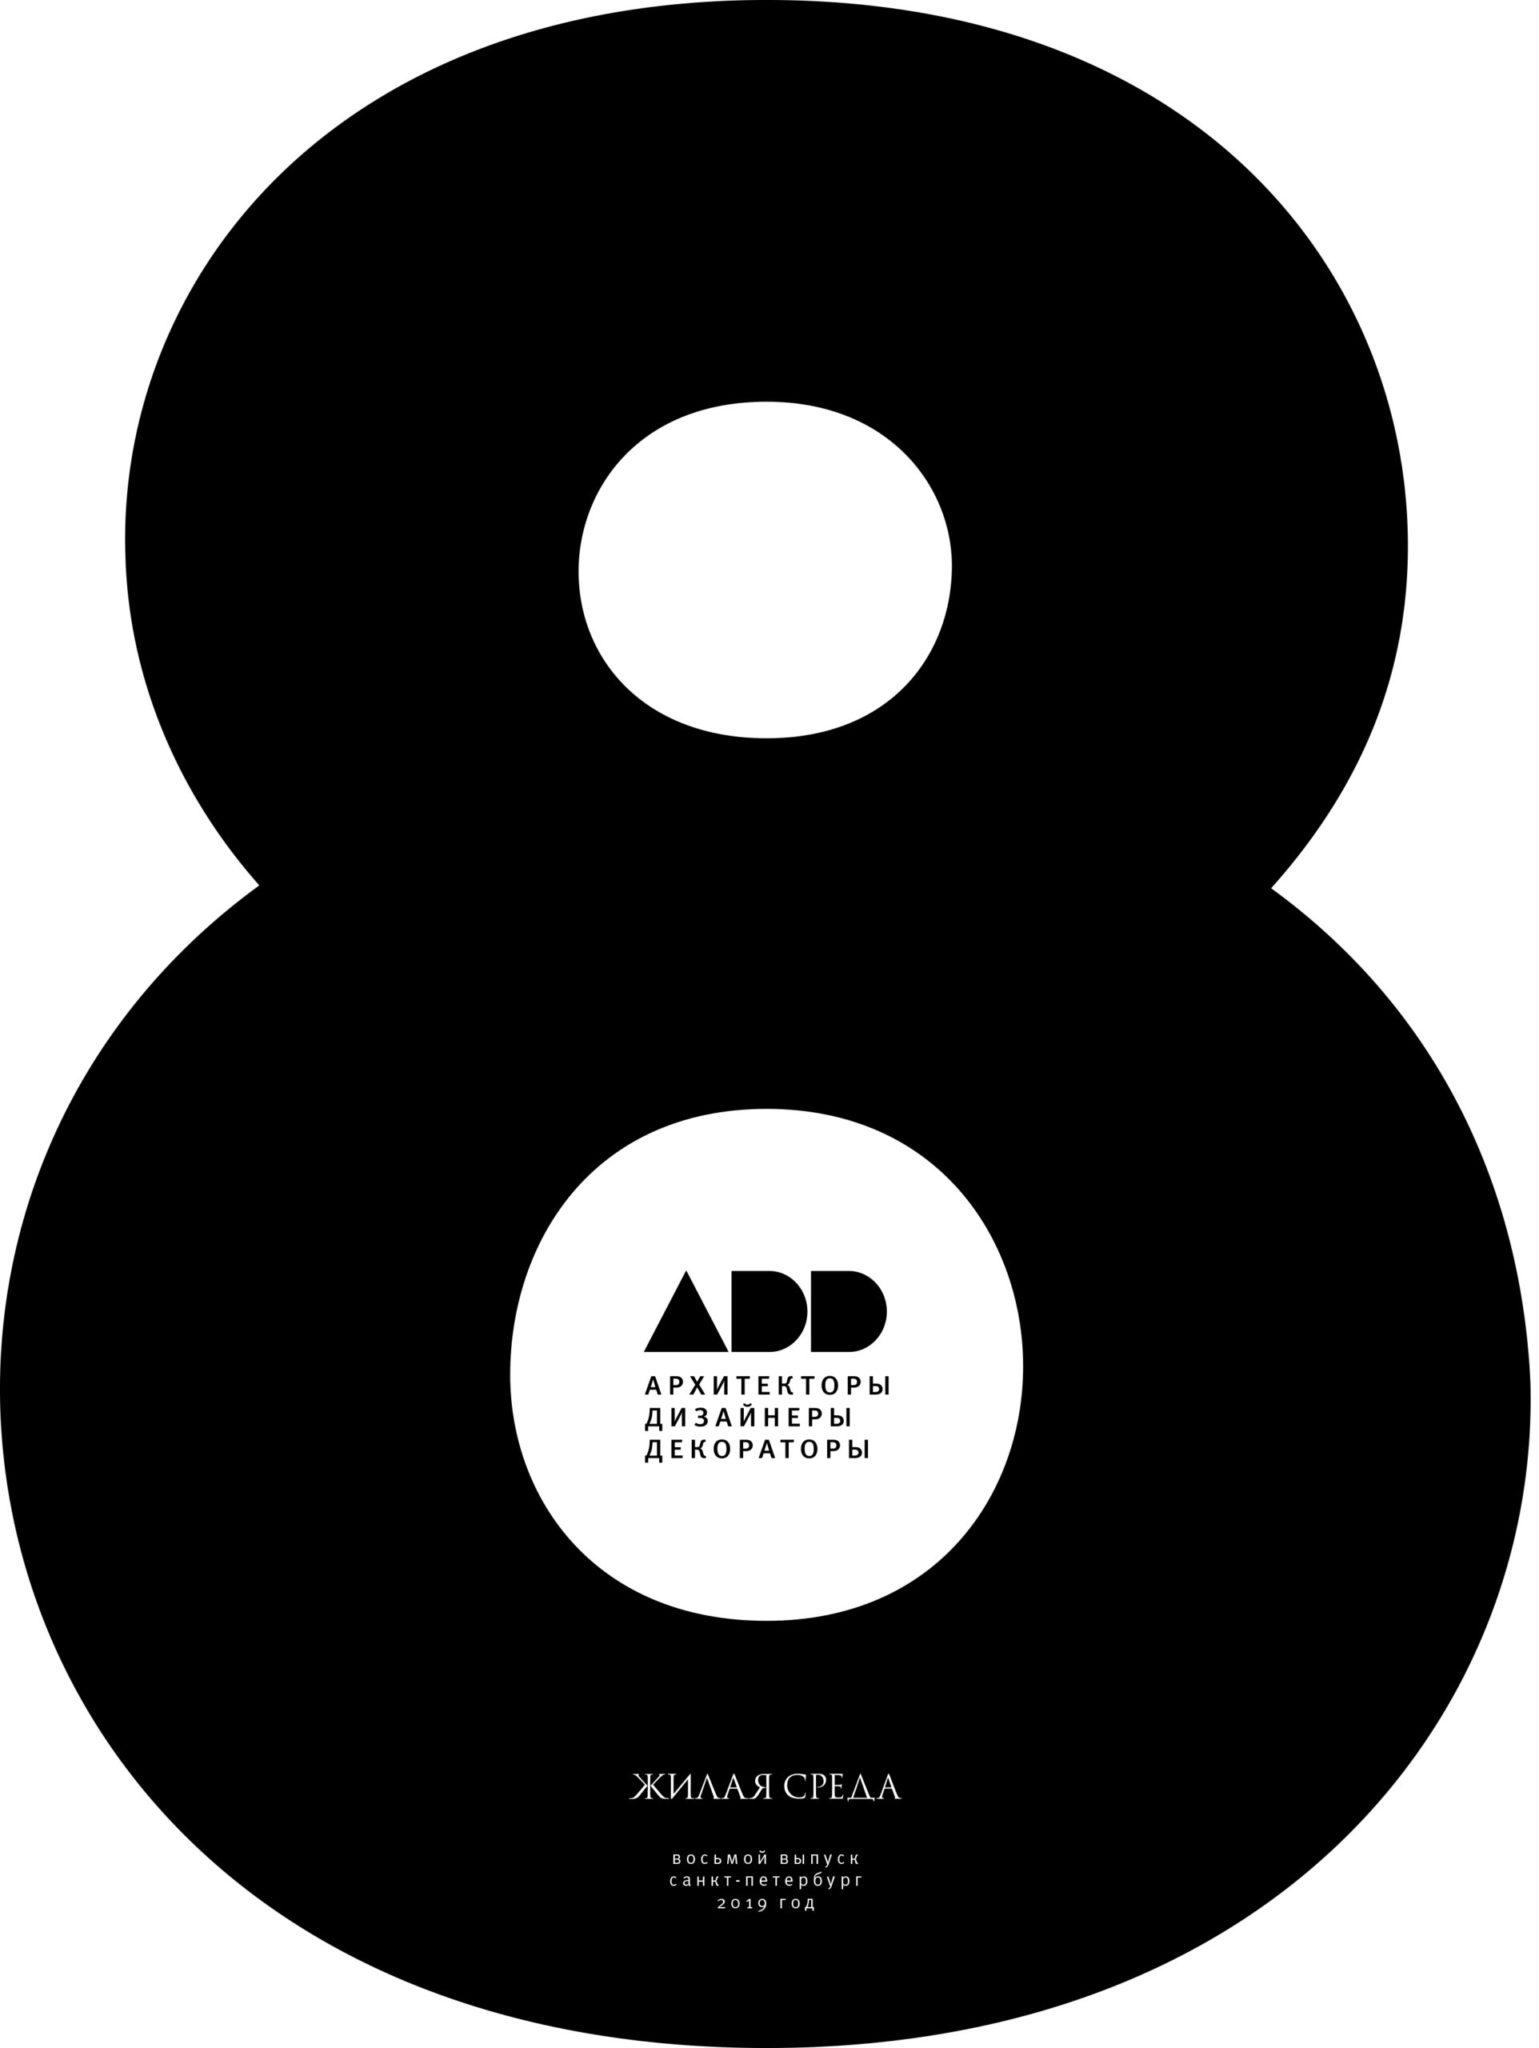 ADD AWARDS 2018